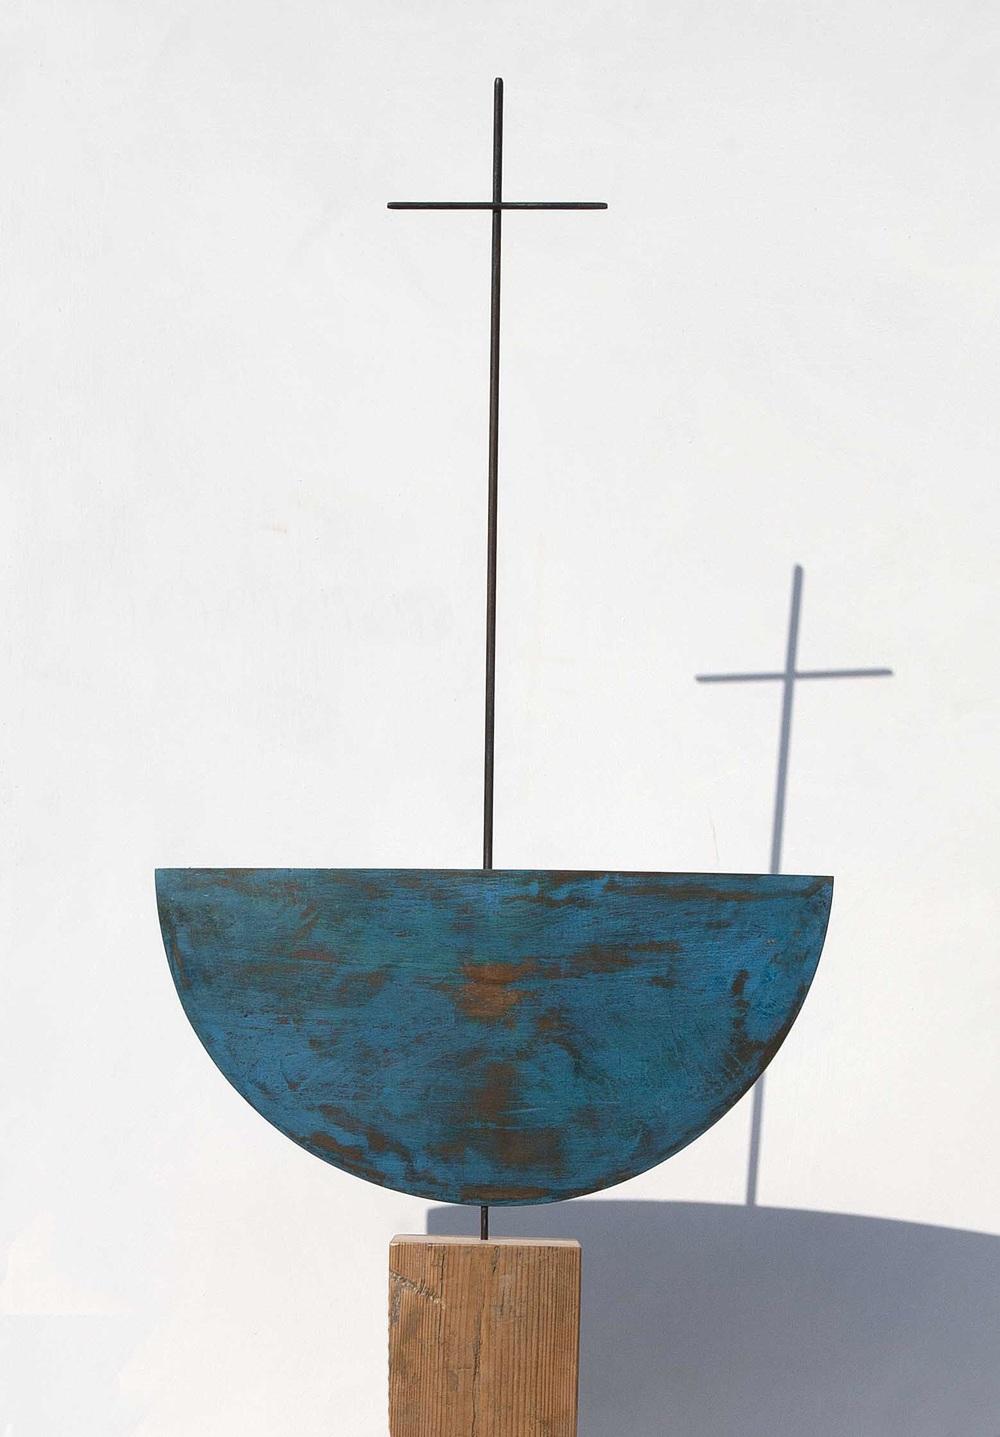 David O'Connor - Sculpture